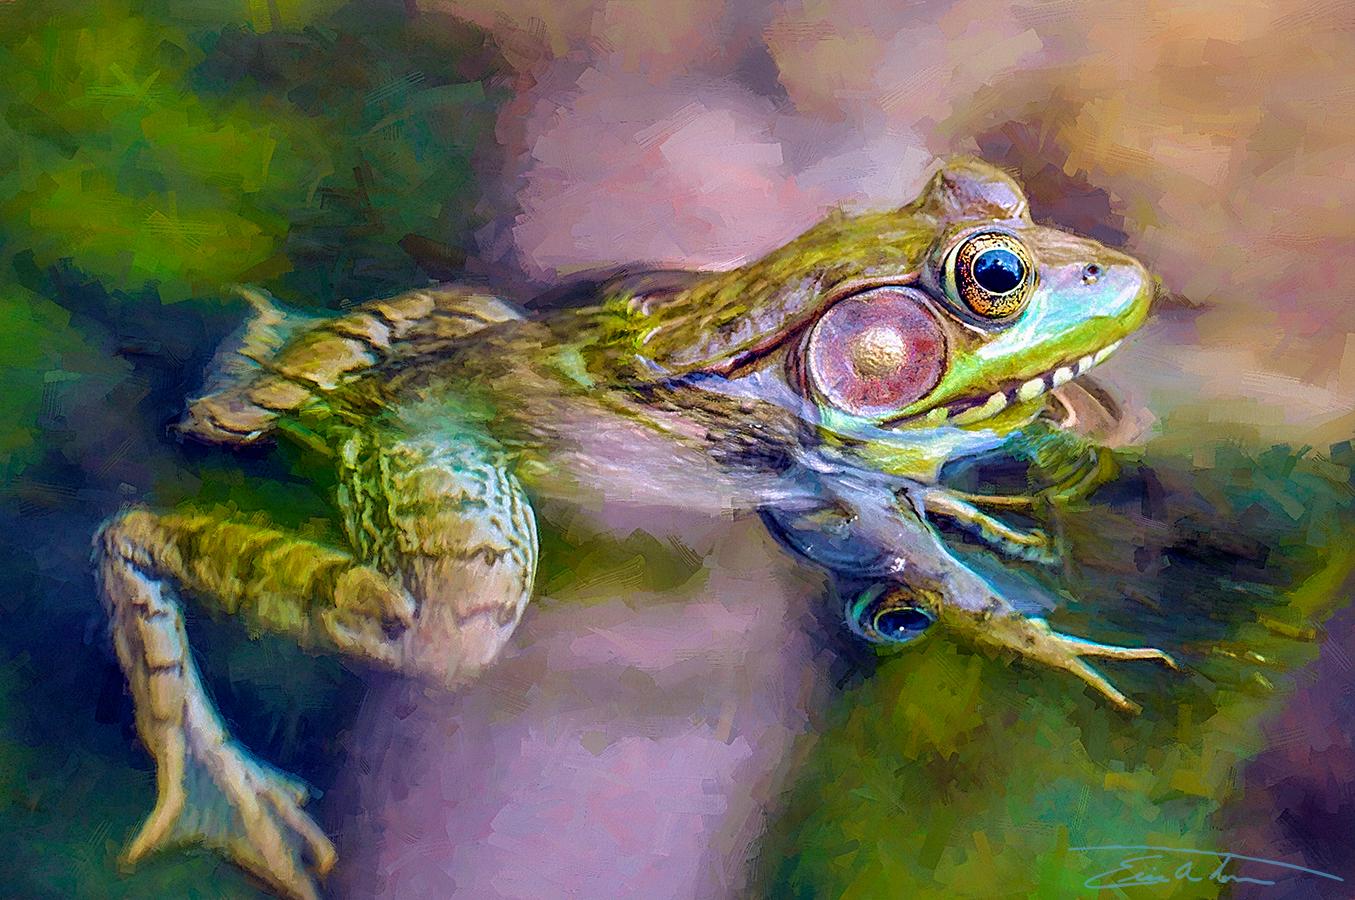 Frog In The Creek by eccoarts